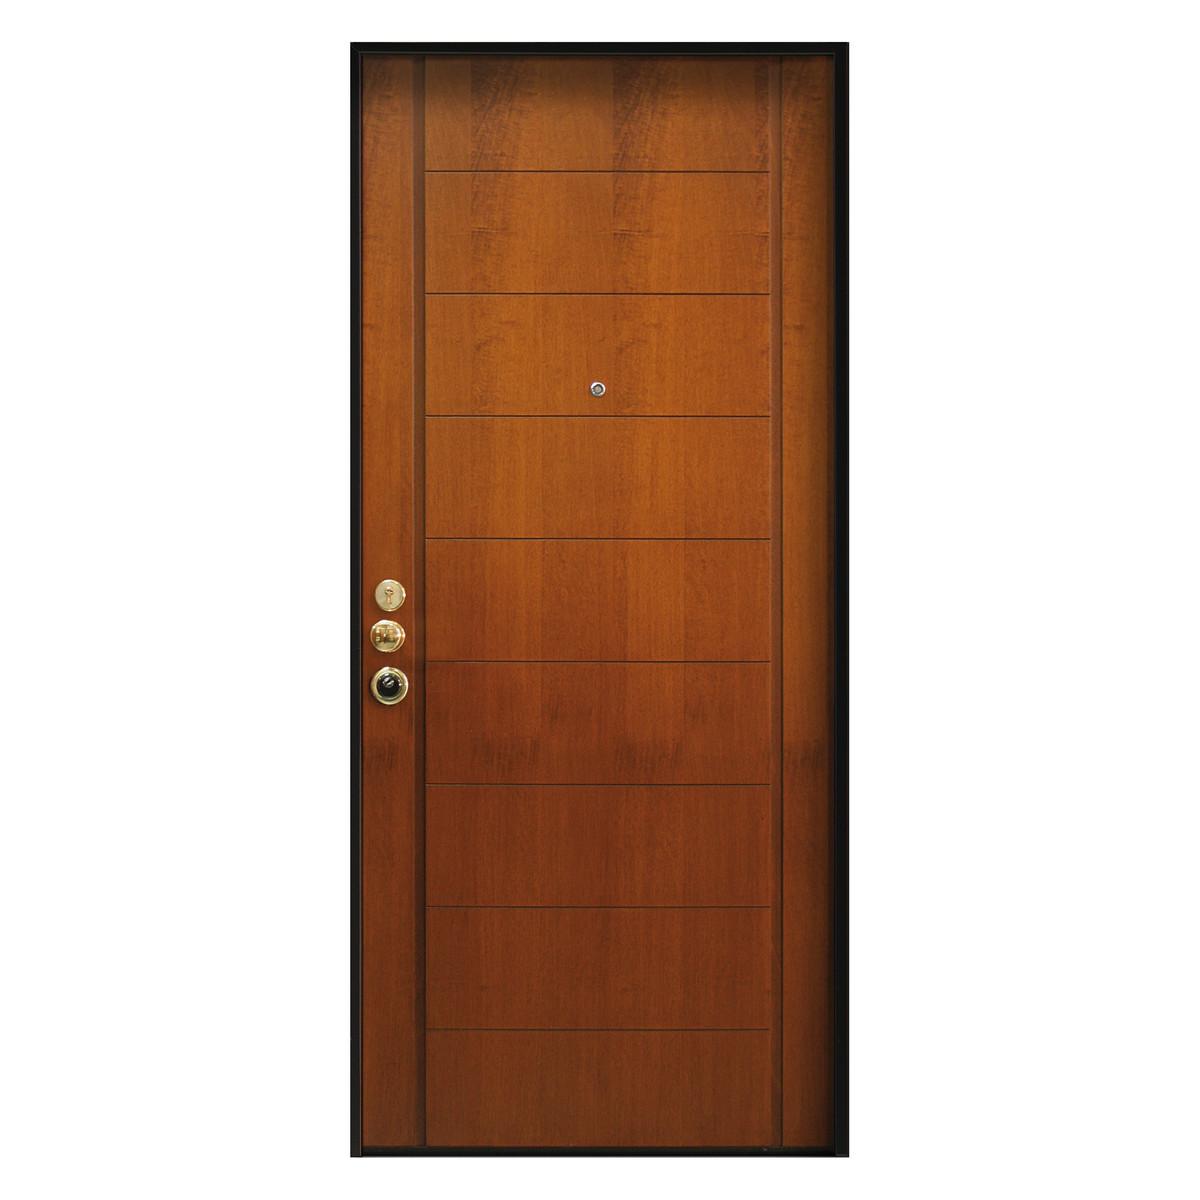 Porta blindata best tanganika medio l 90 x h 210 cm dx - Rivestimento porta blindata leroy merlin ...